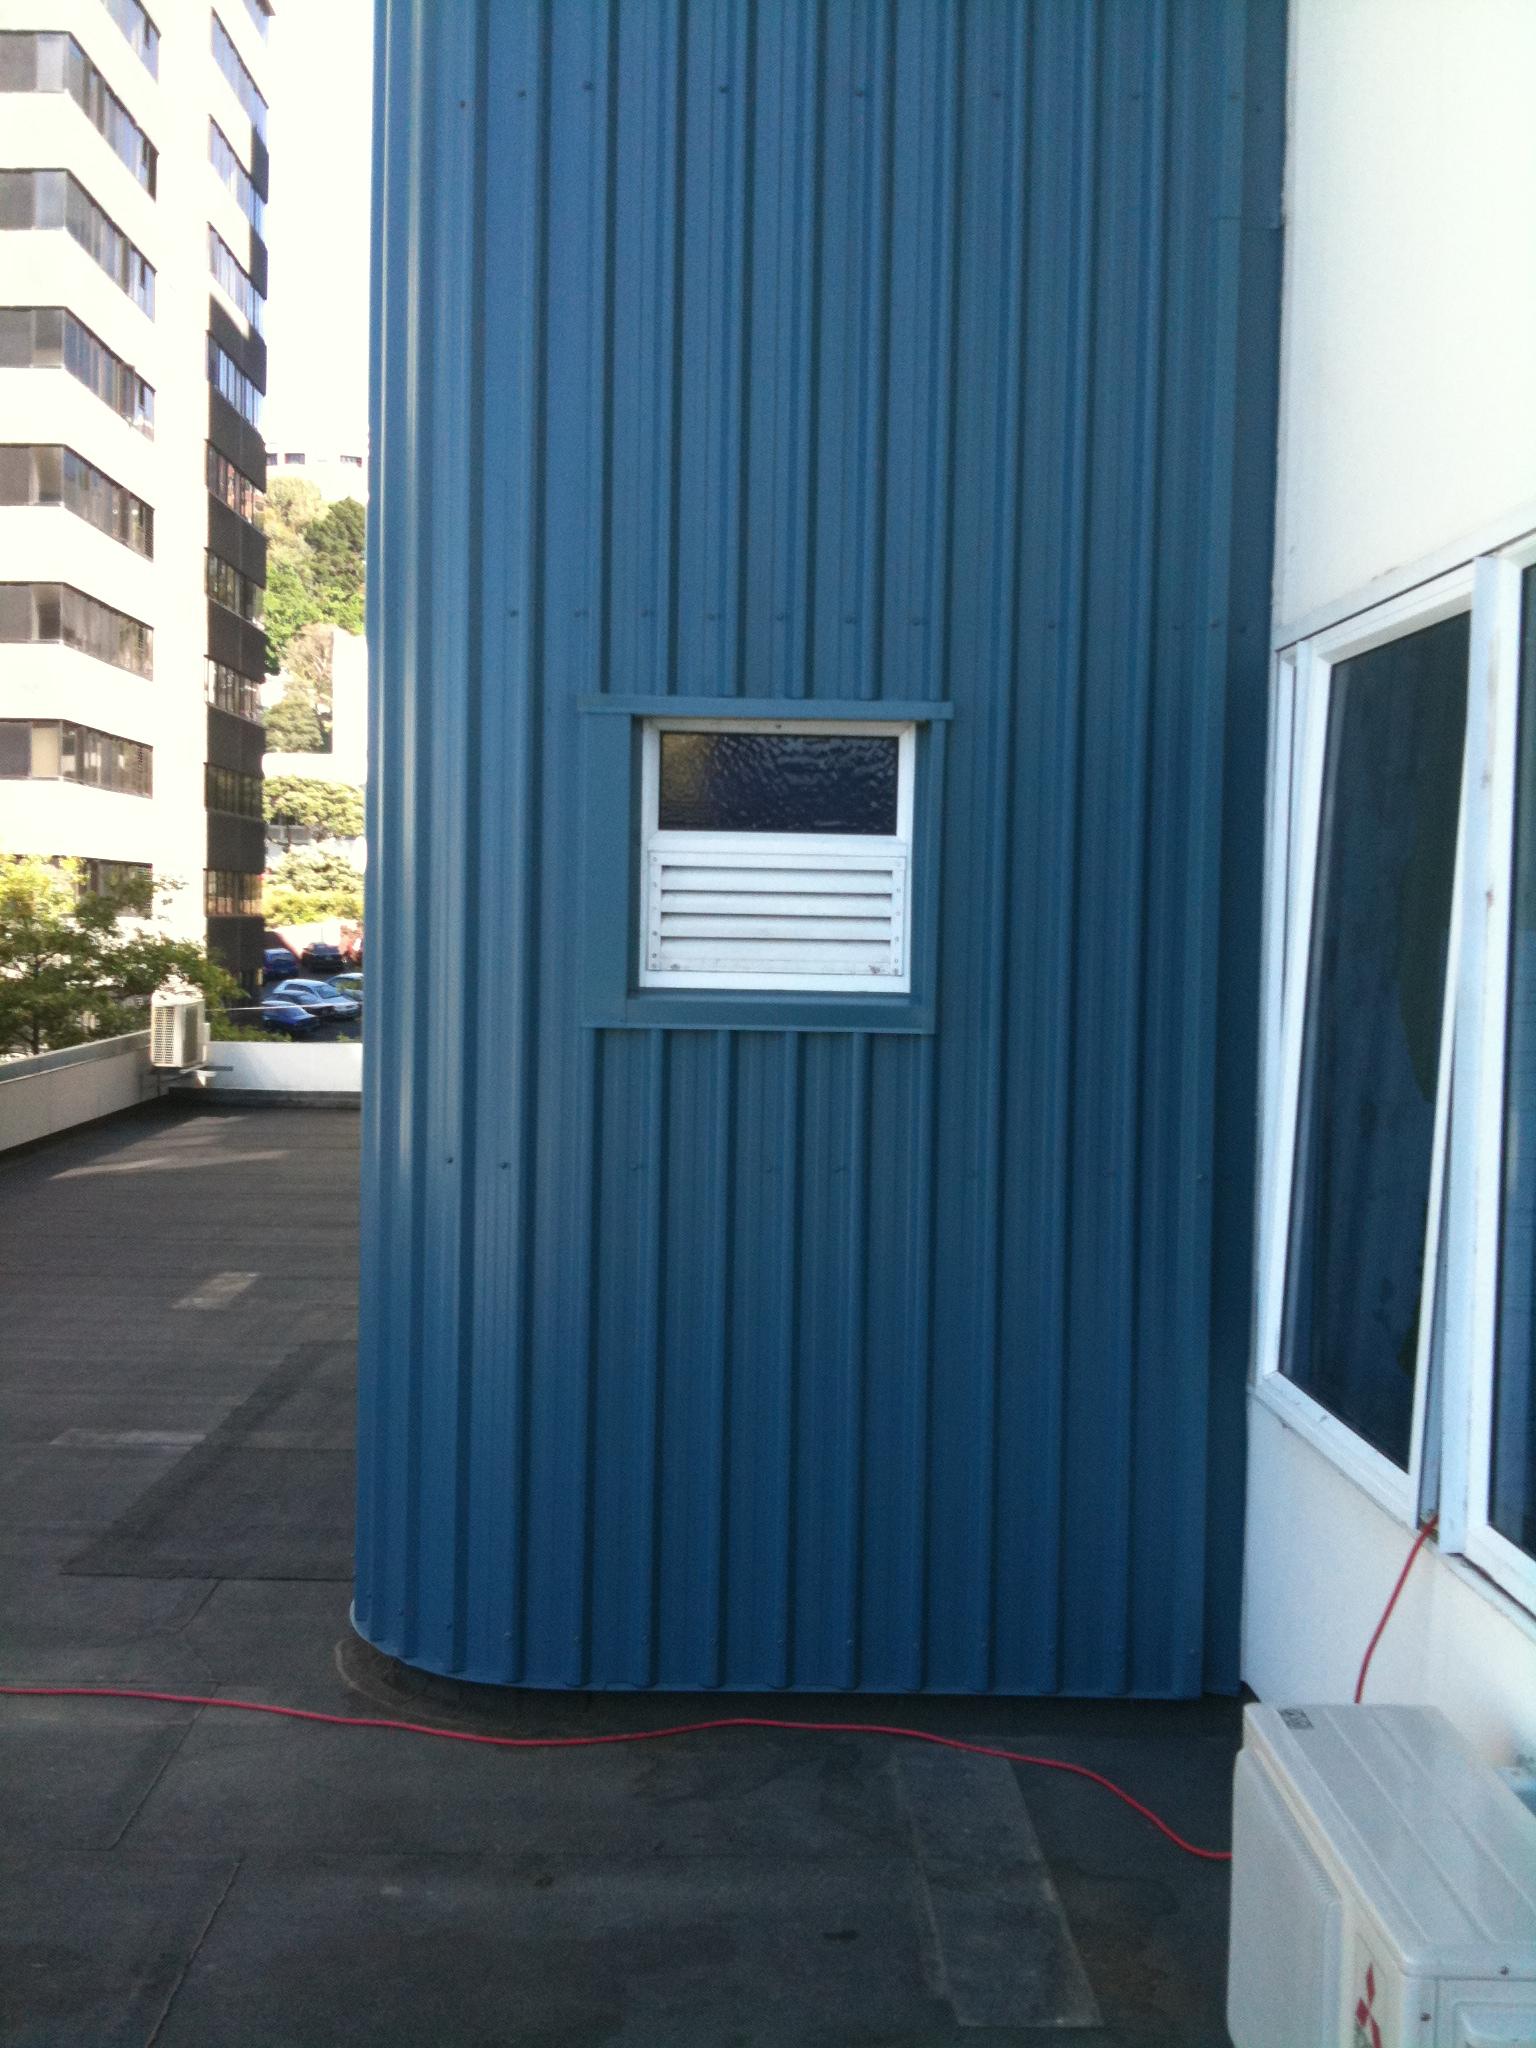 Reroof Wellington Corrugated Iron Premier Roofing We